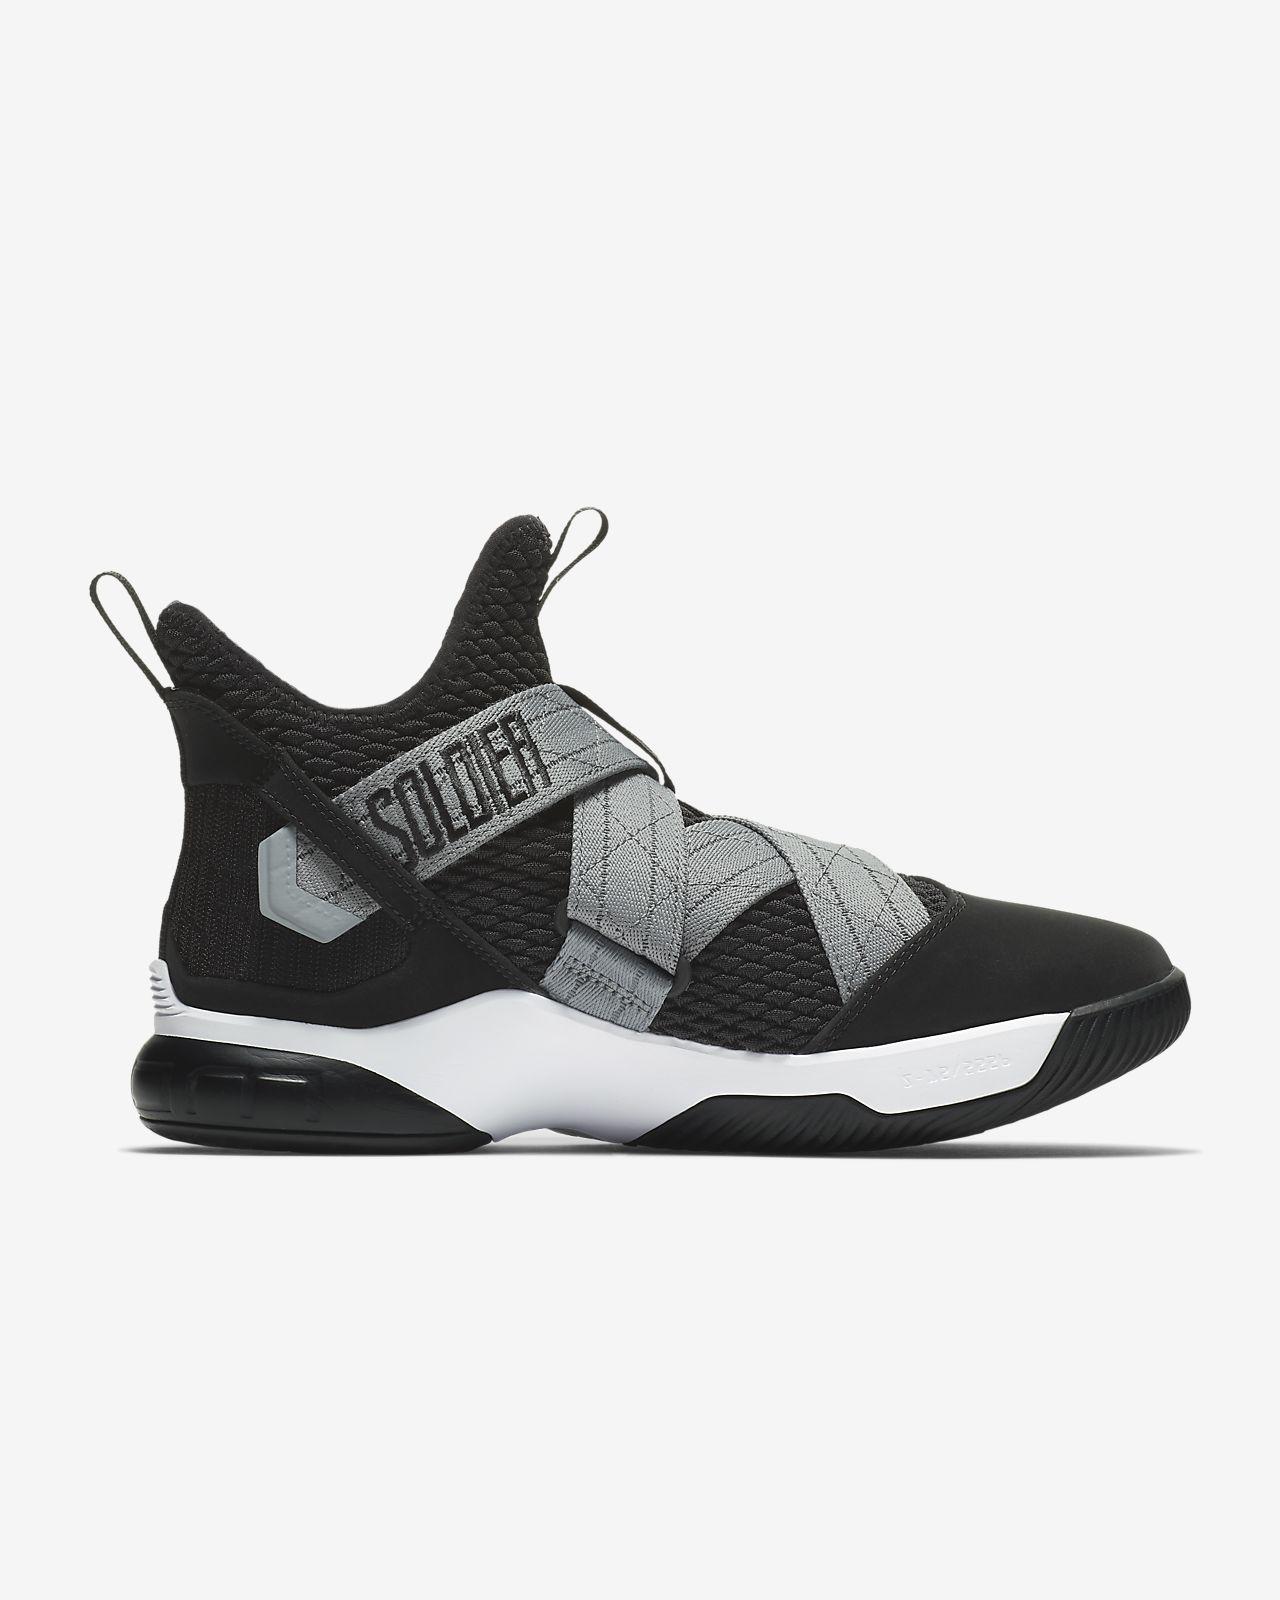 481f1be20b1 LeBron Soldier 12 SFG Basketball Shoe. Nike.com MY